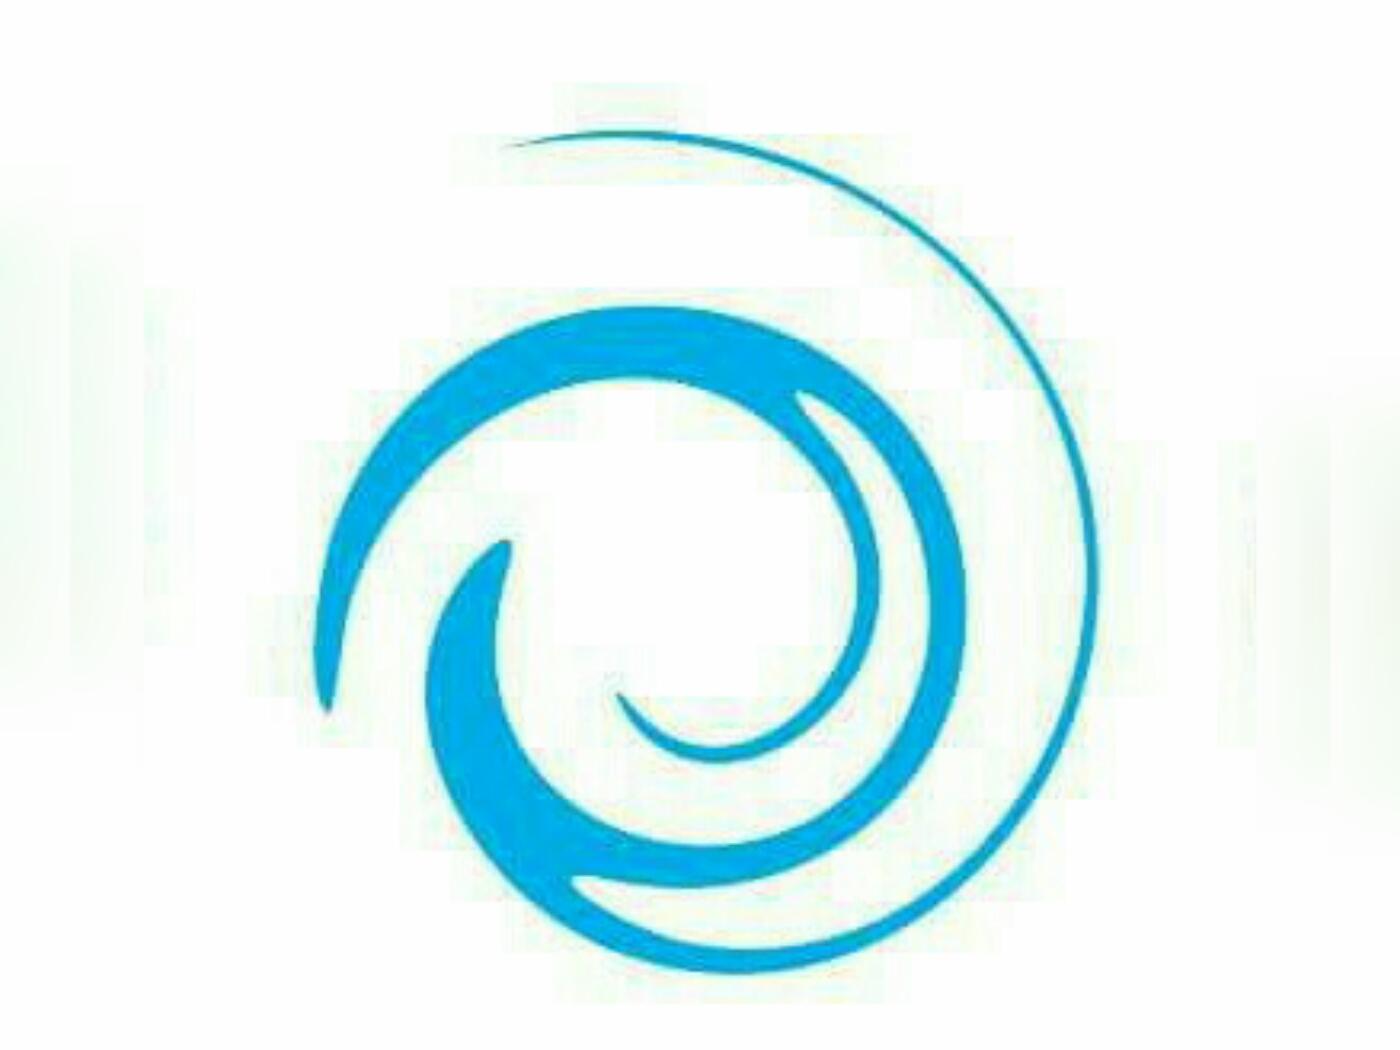 Logo design by Hareem Sulaiman on Dribbble